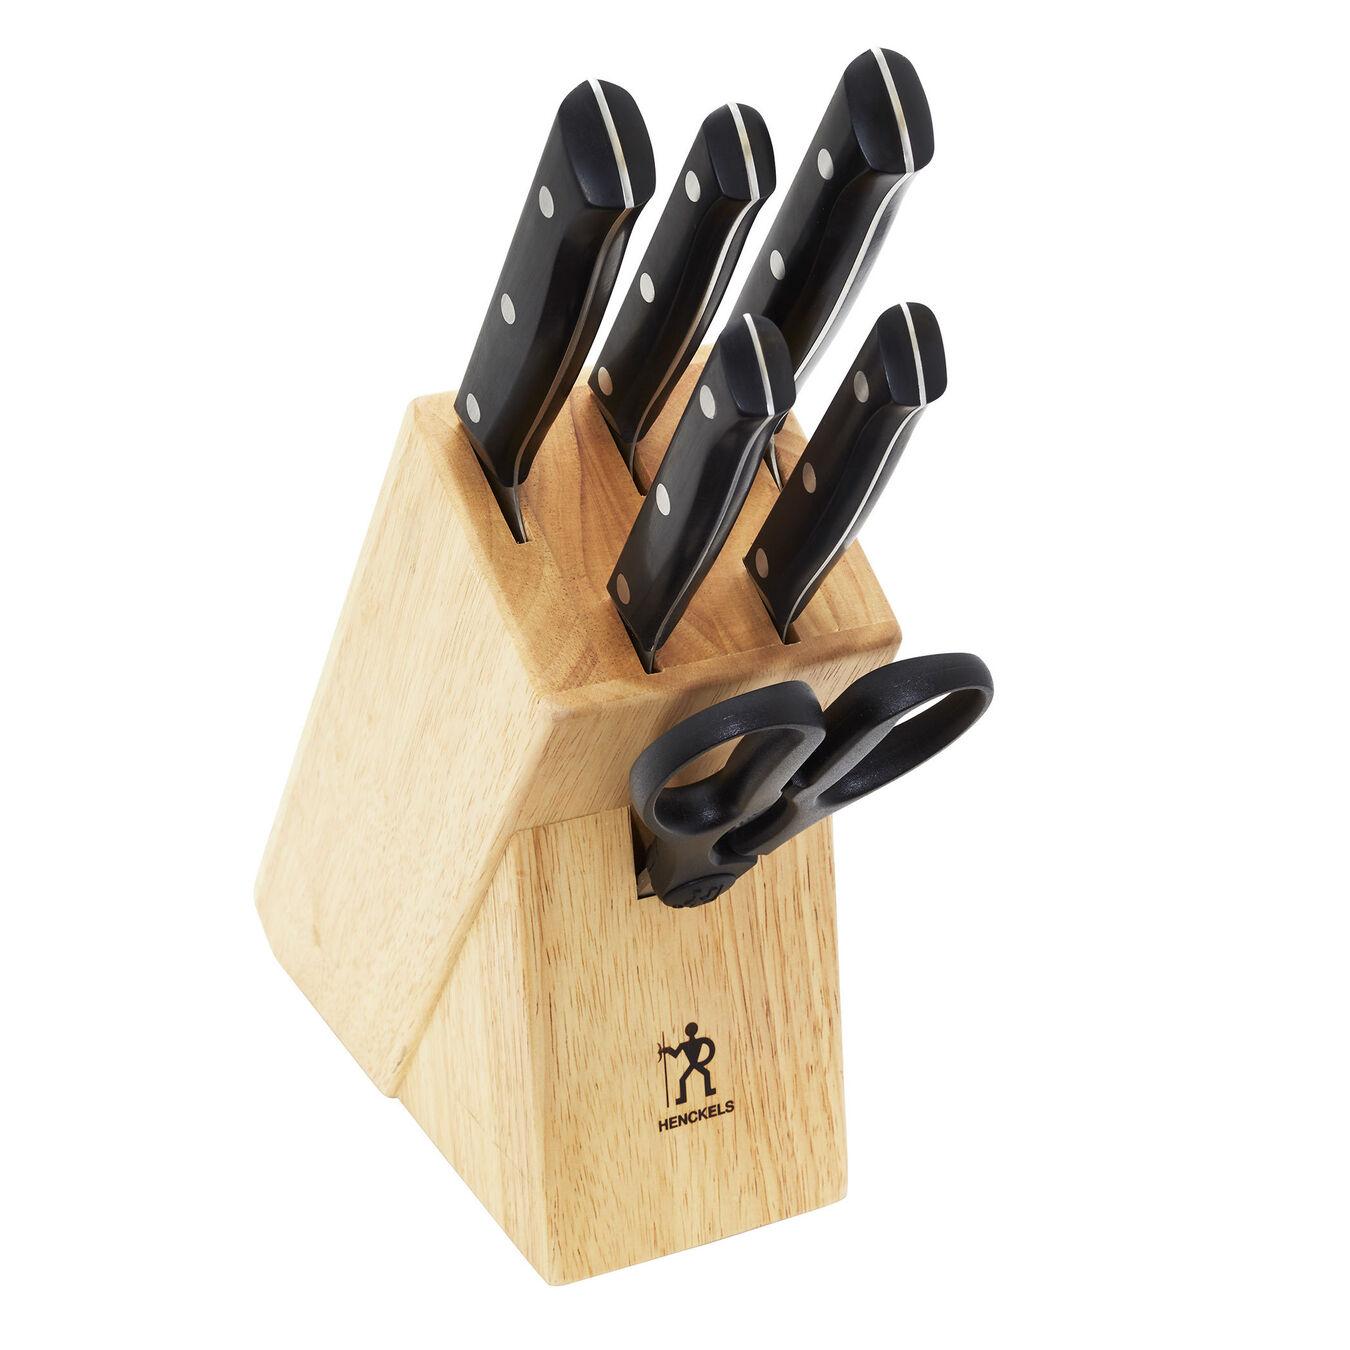 7-pc, Knife block set, black matte,,large 3